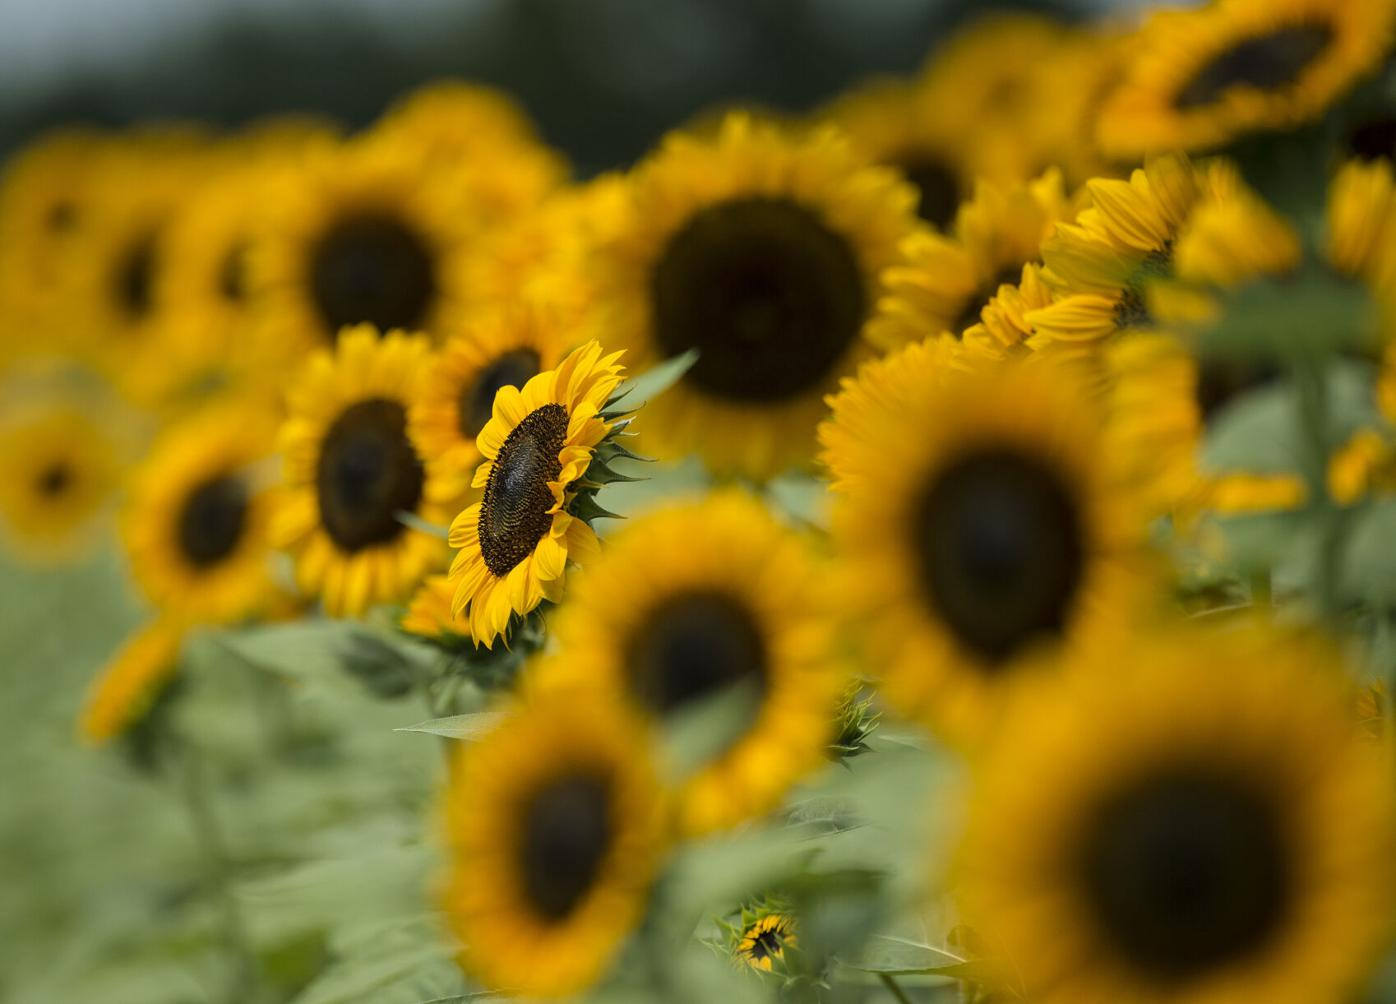 Sunflowers at Harvest Lane Farms